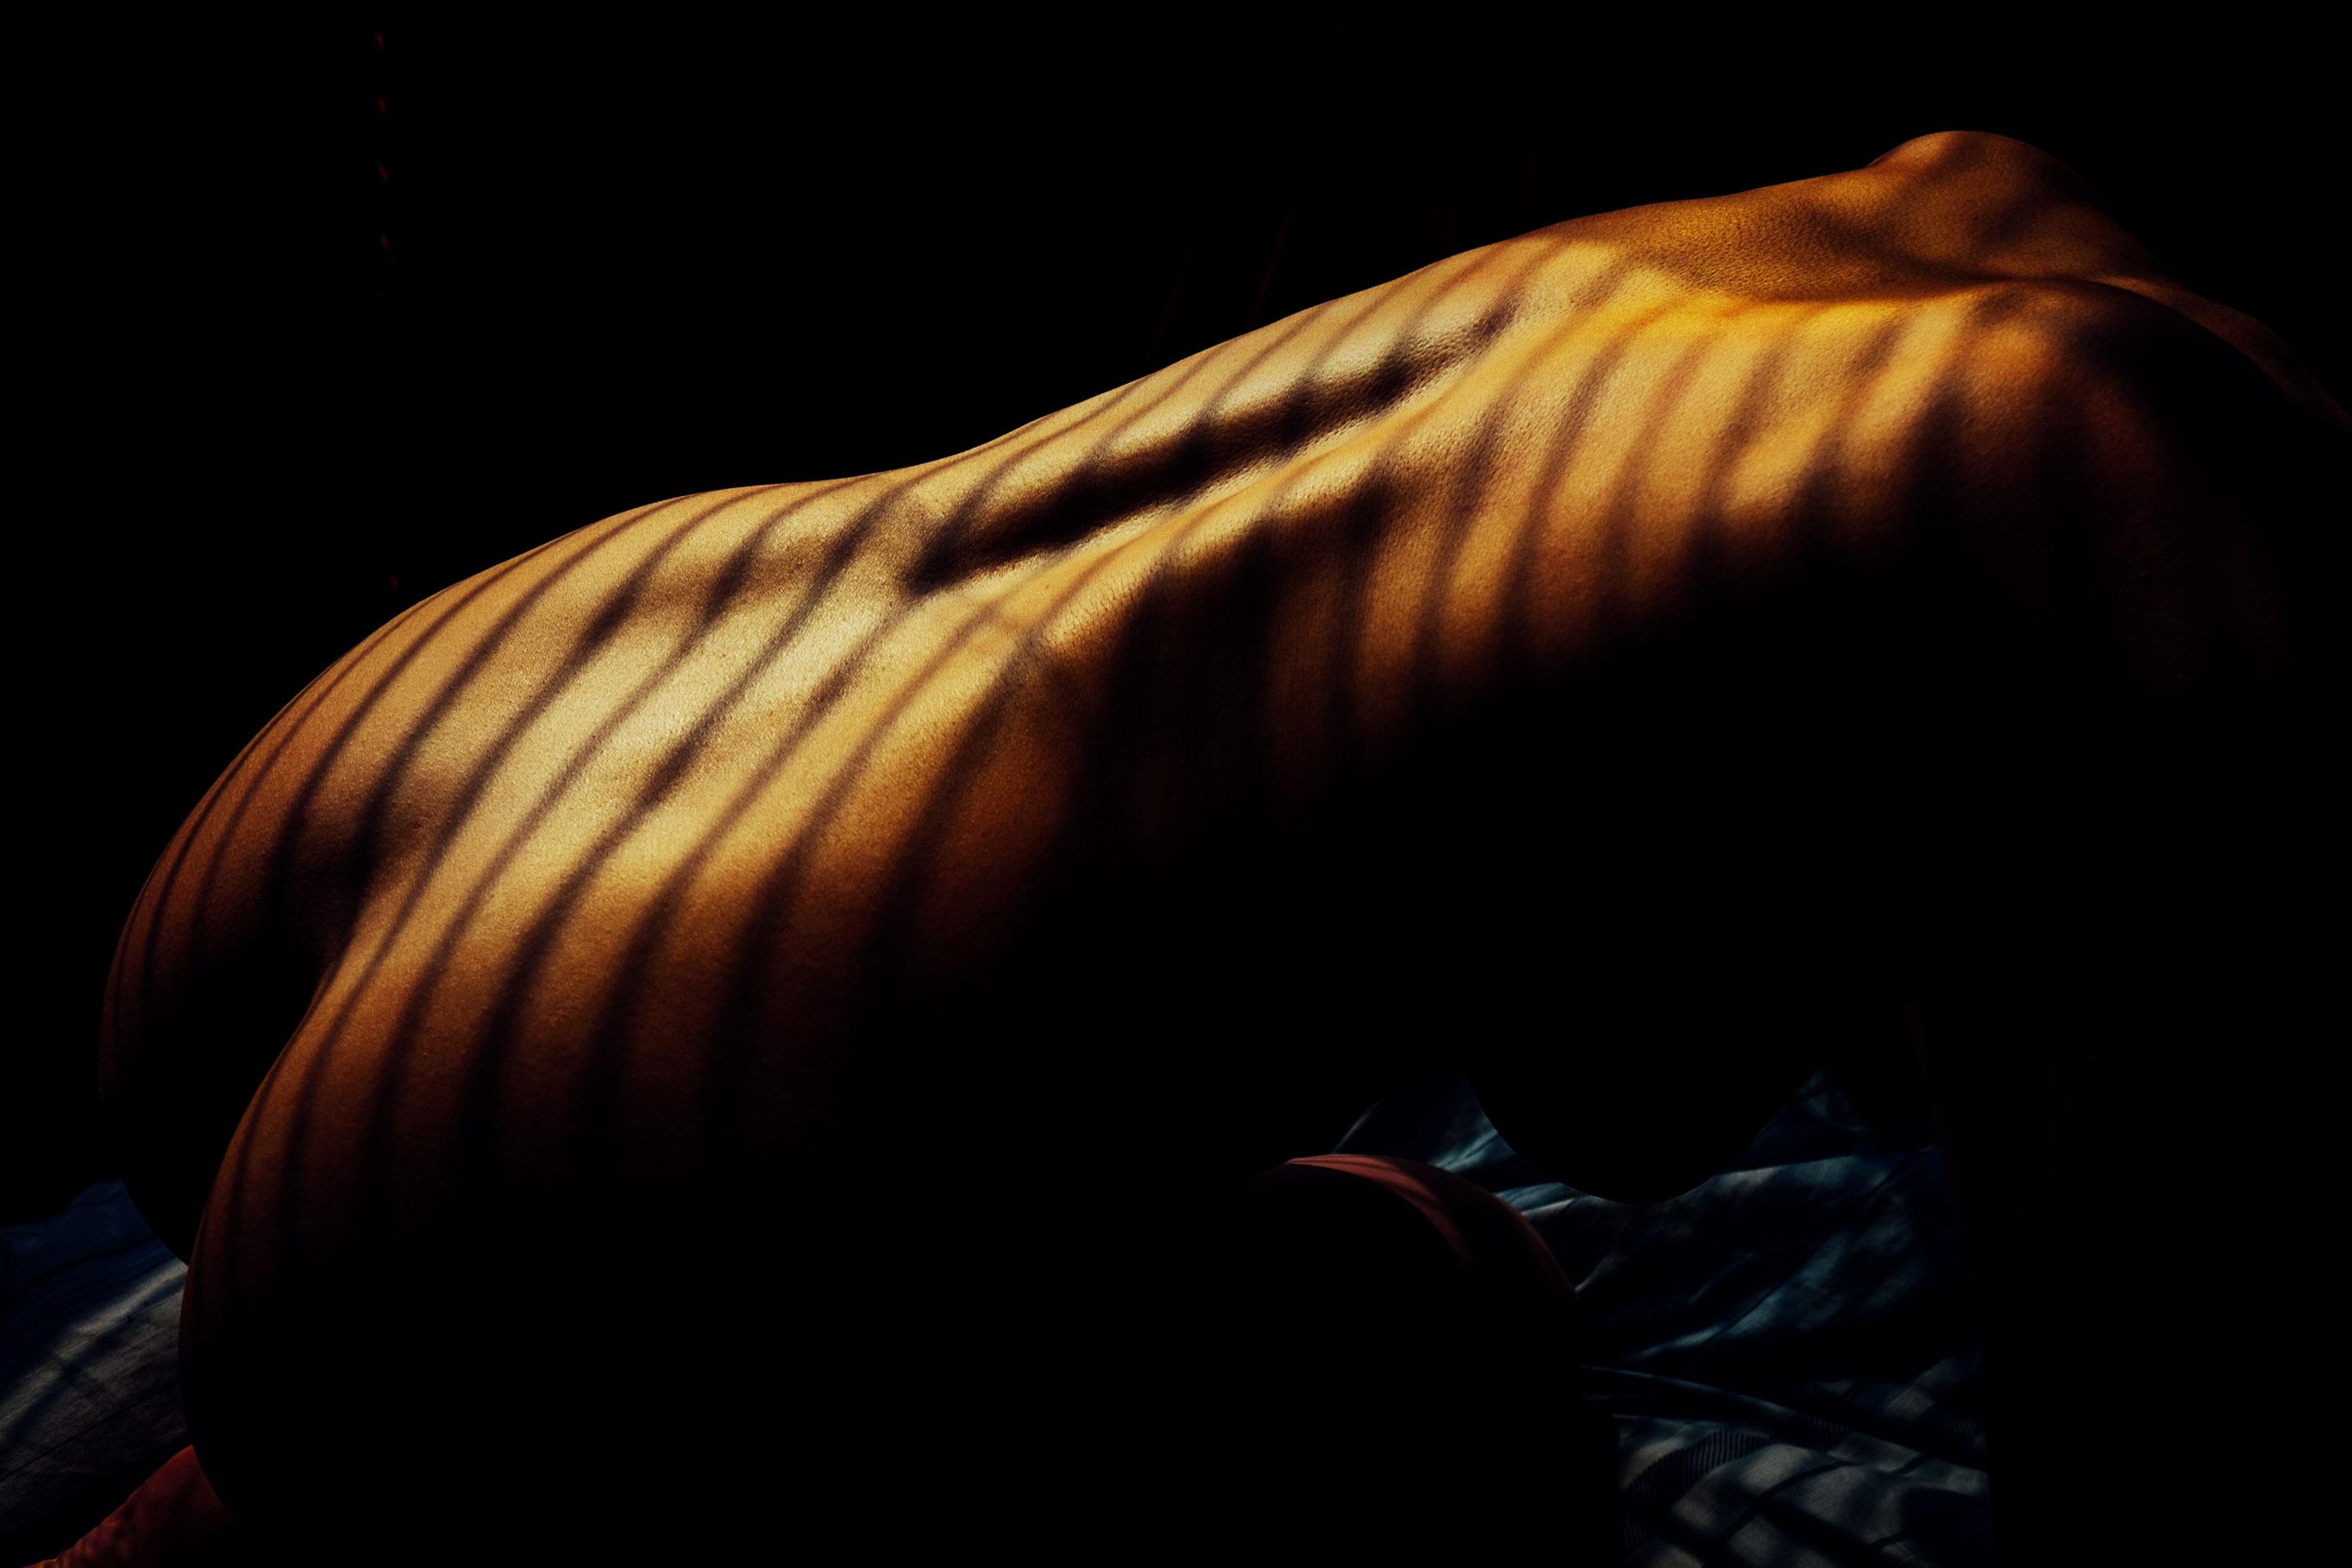 Clara Rene nude by Yan Senez